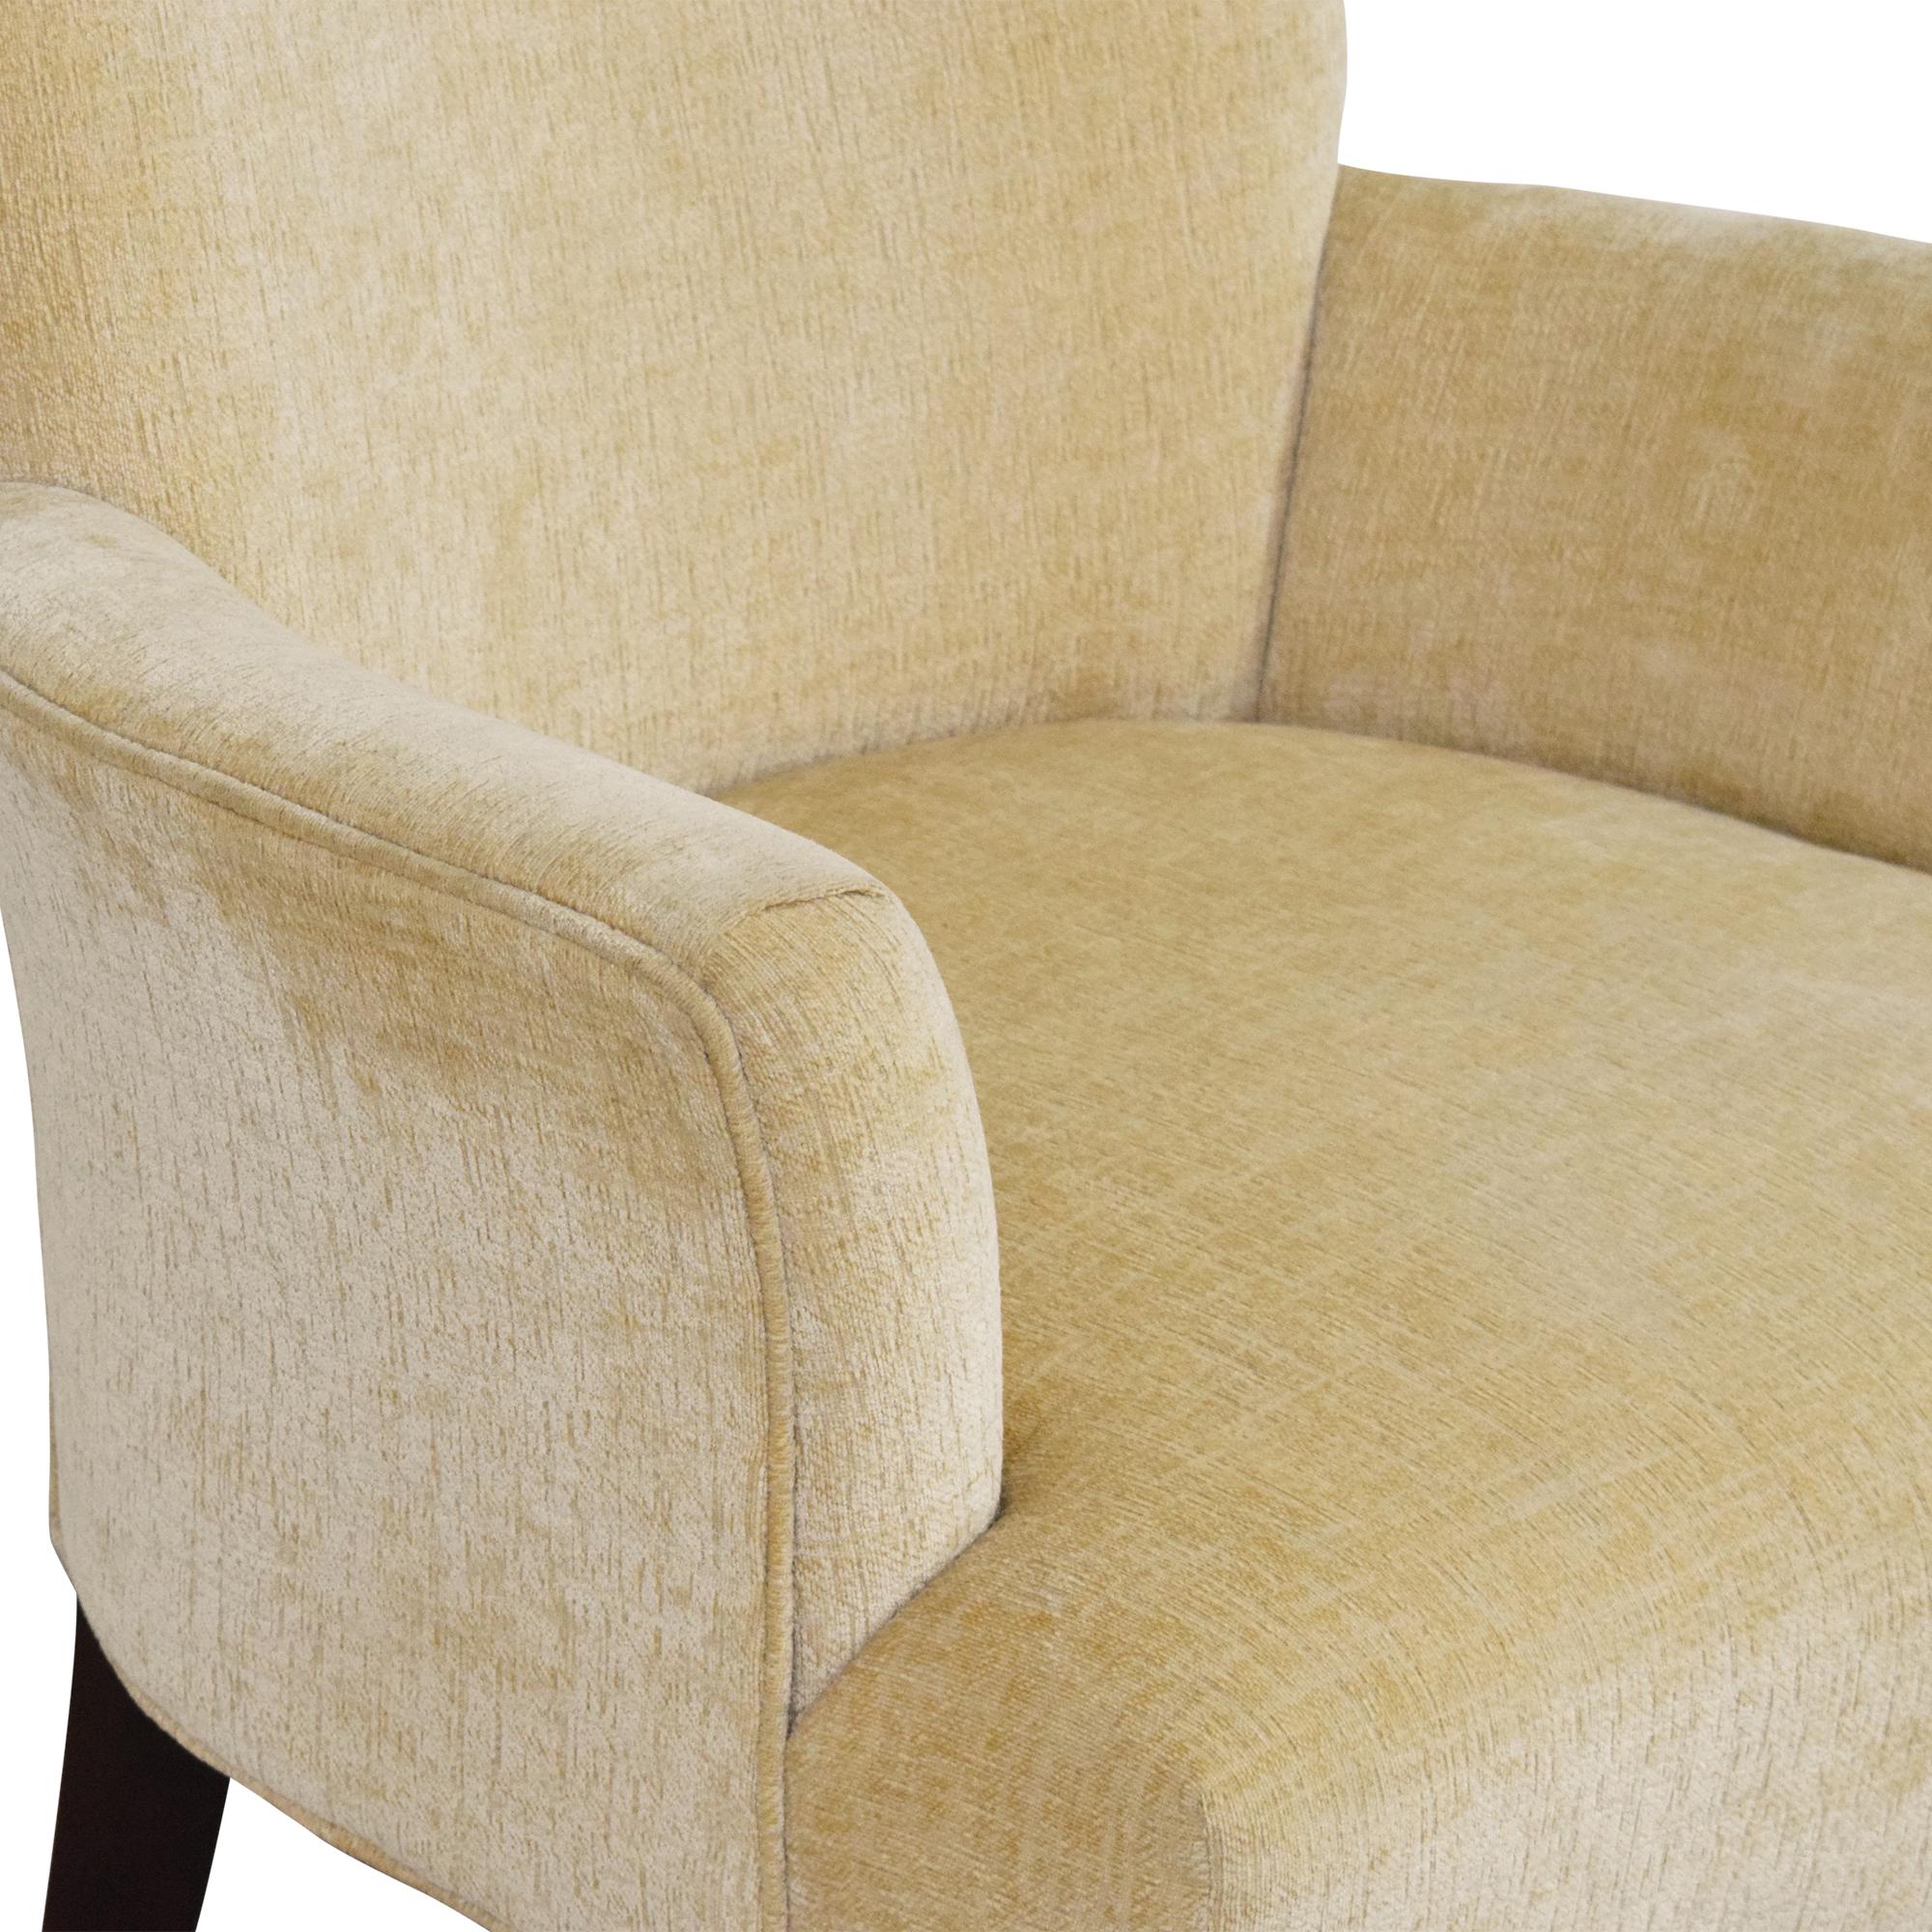 Crate & Barrel Crate & Barrel Accent Arm Chair pa